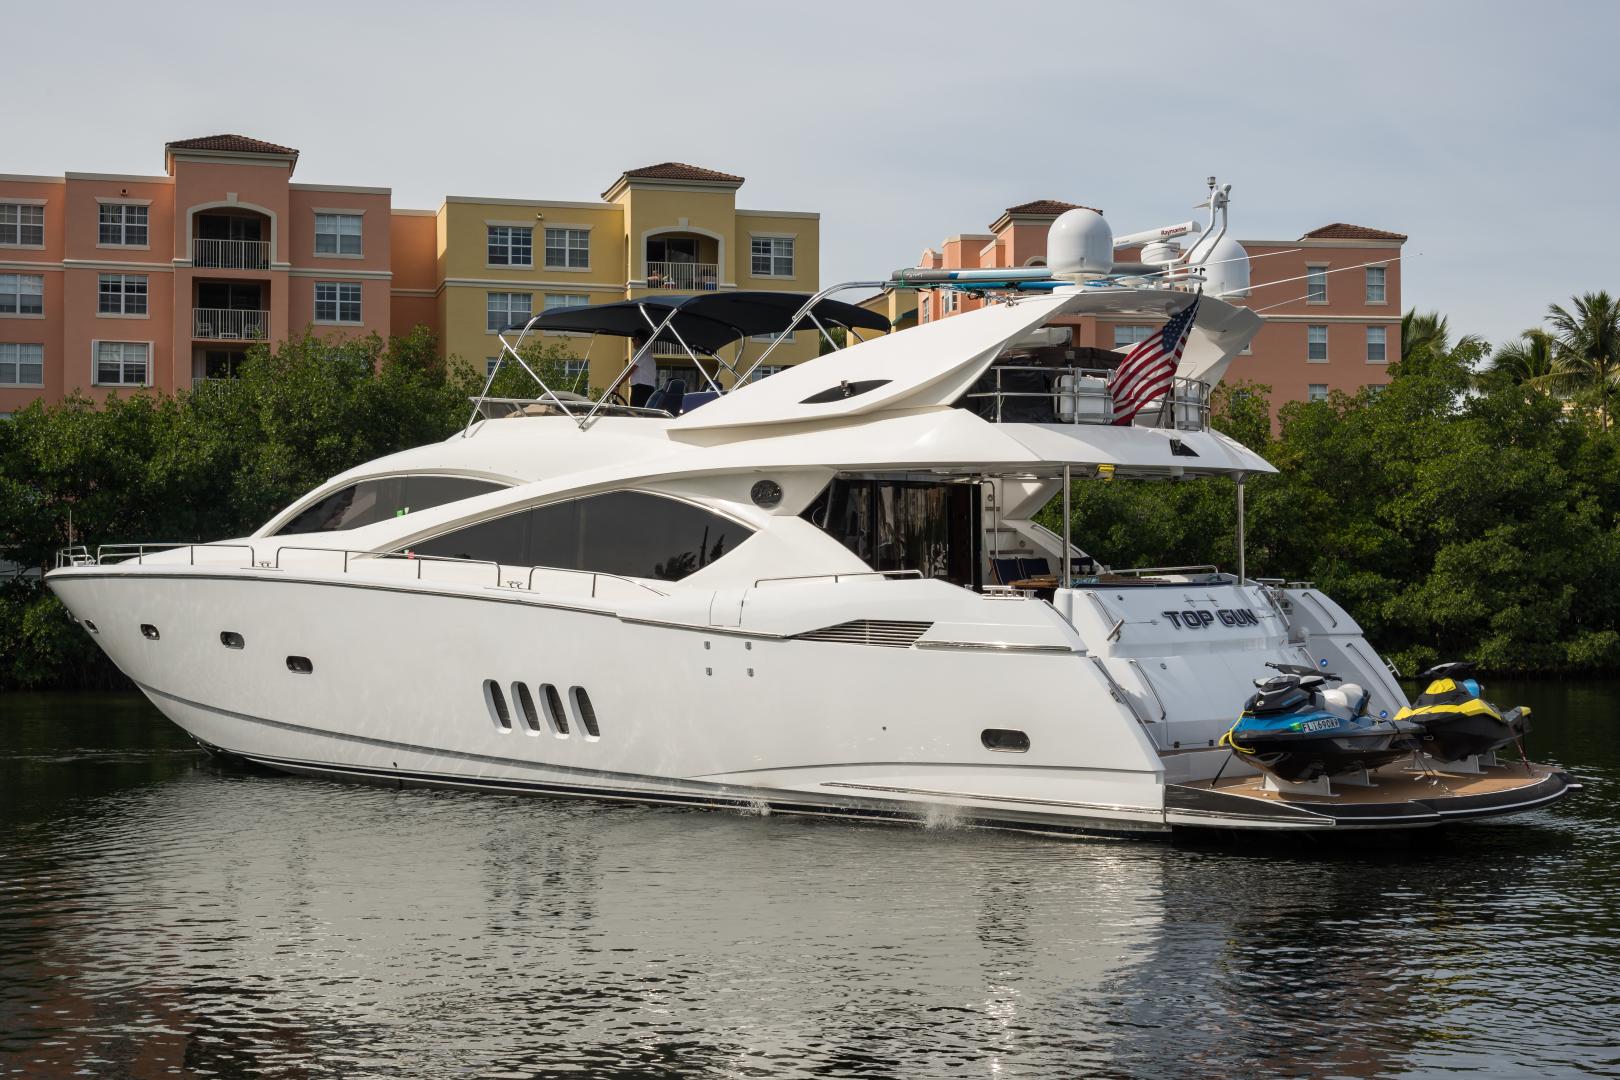 Sunseeker-Yacht 2004-TOP GUN Aventura-Florida-United States-1450740 | Thumbnail